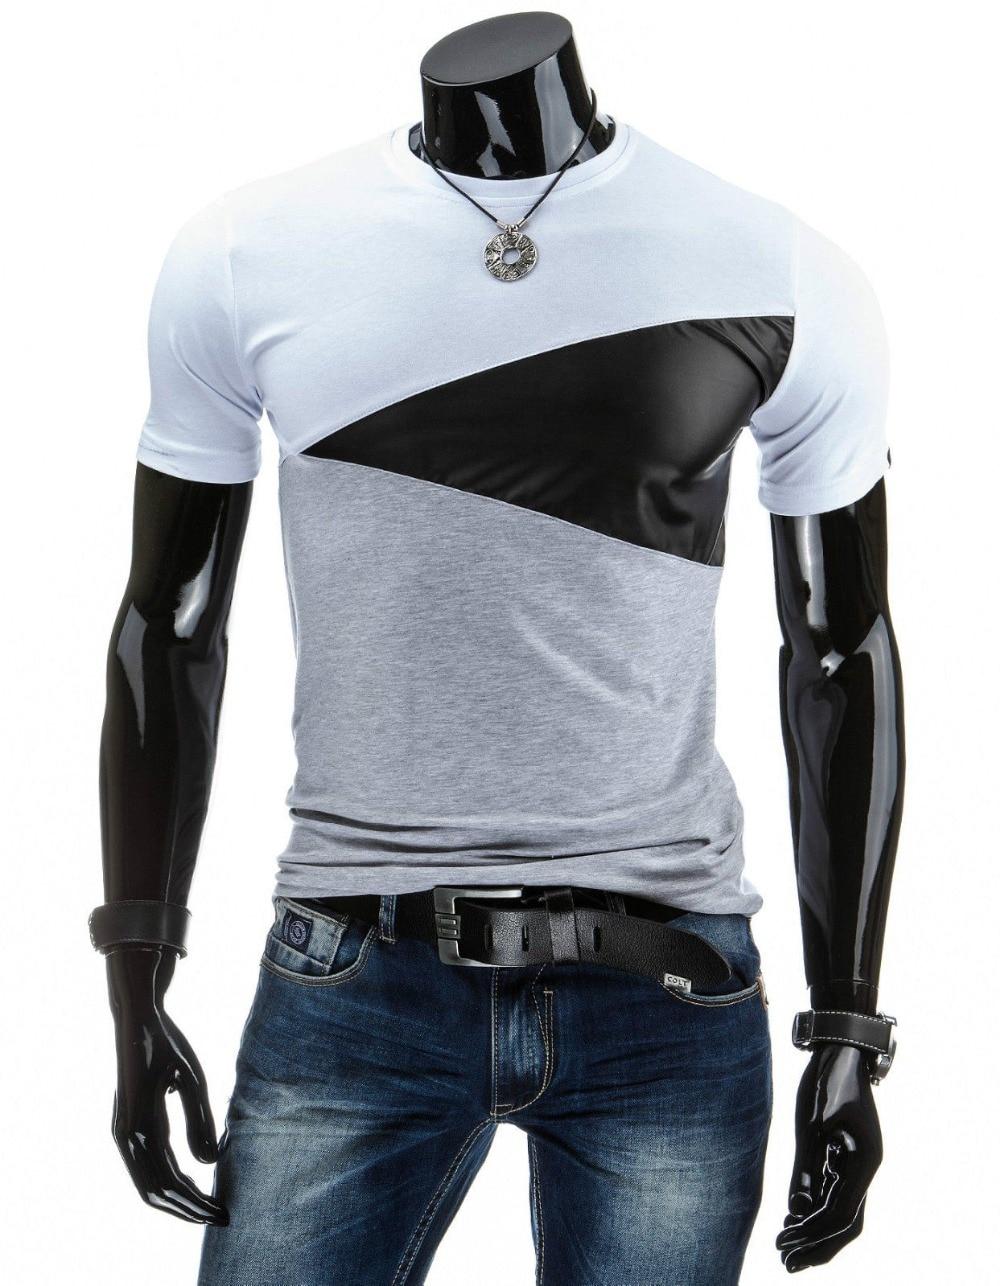 Shirt design for mens - 2016 Designs Mens T Shirt Slim Fit Crew Neck T Shirt Men Short Sleeve Shirt